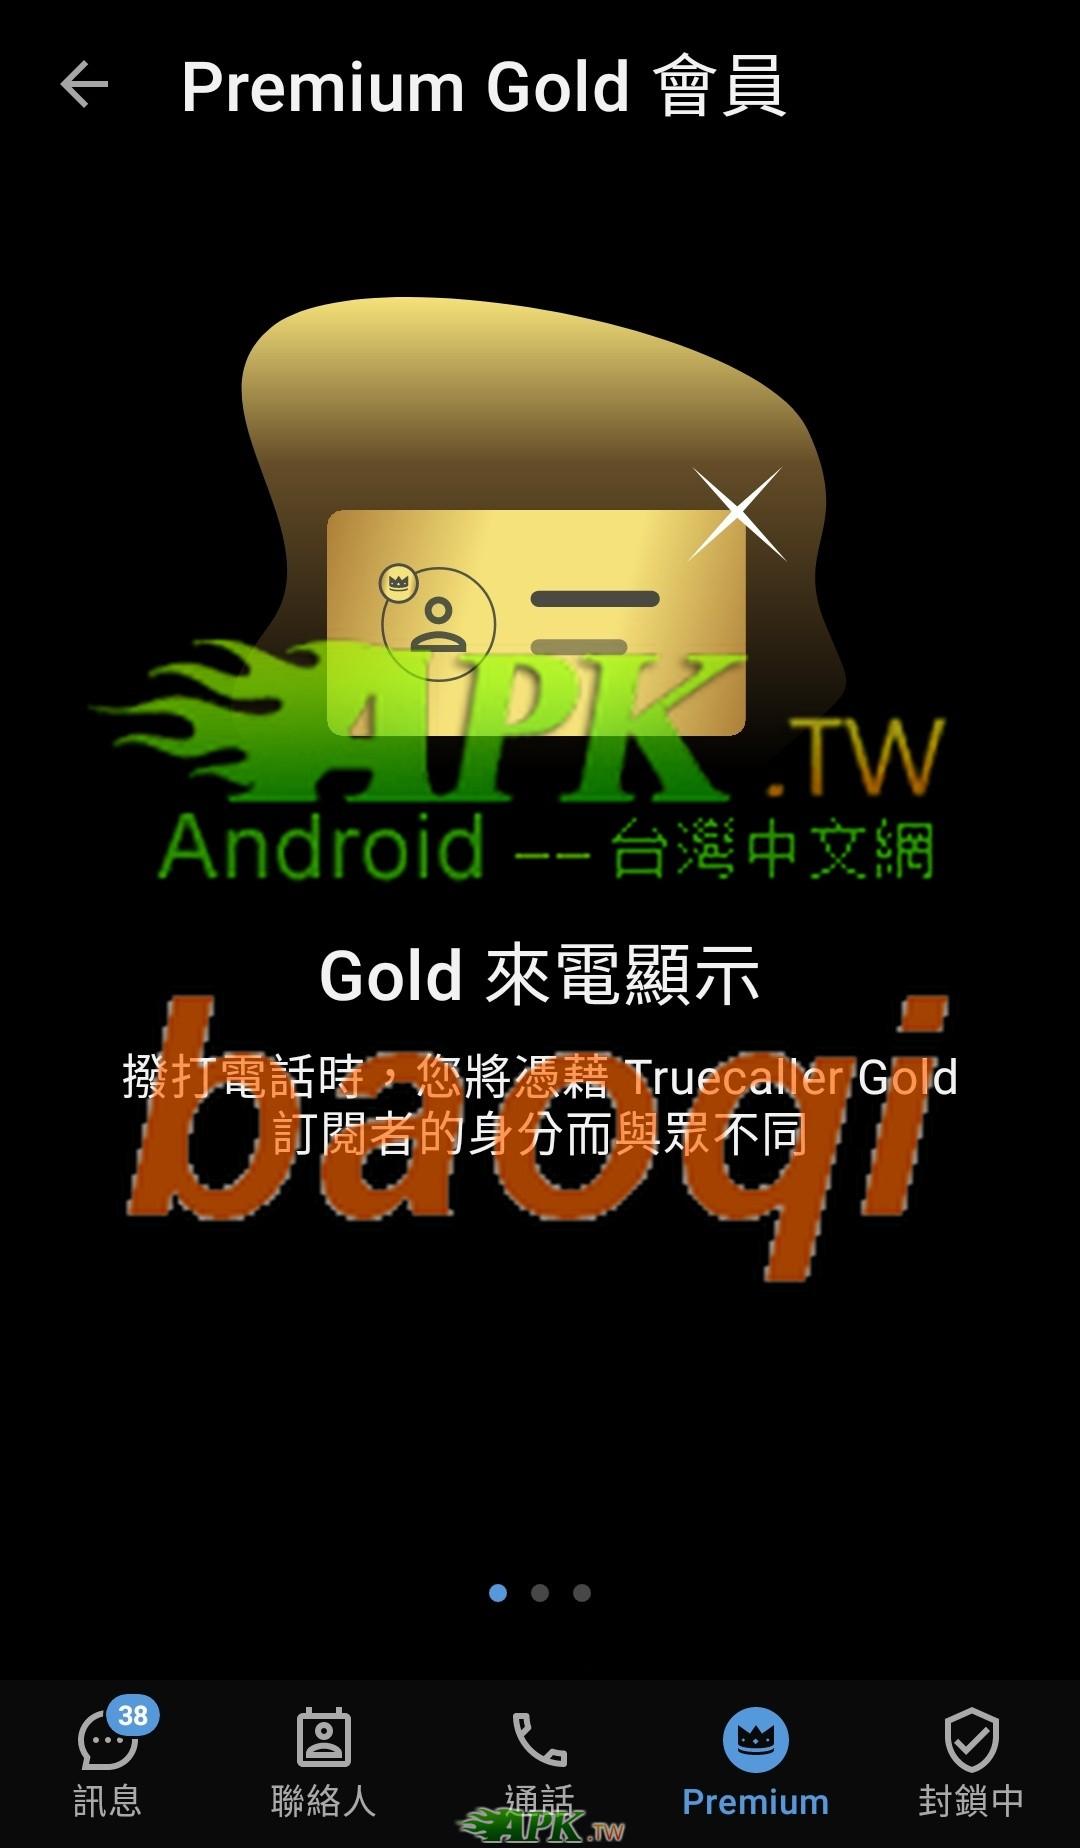 Truecaller_Premium_3_DARK_.jpg